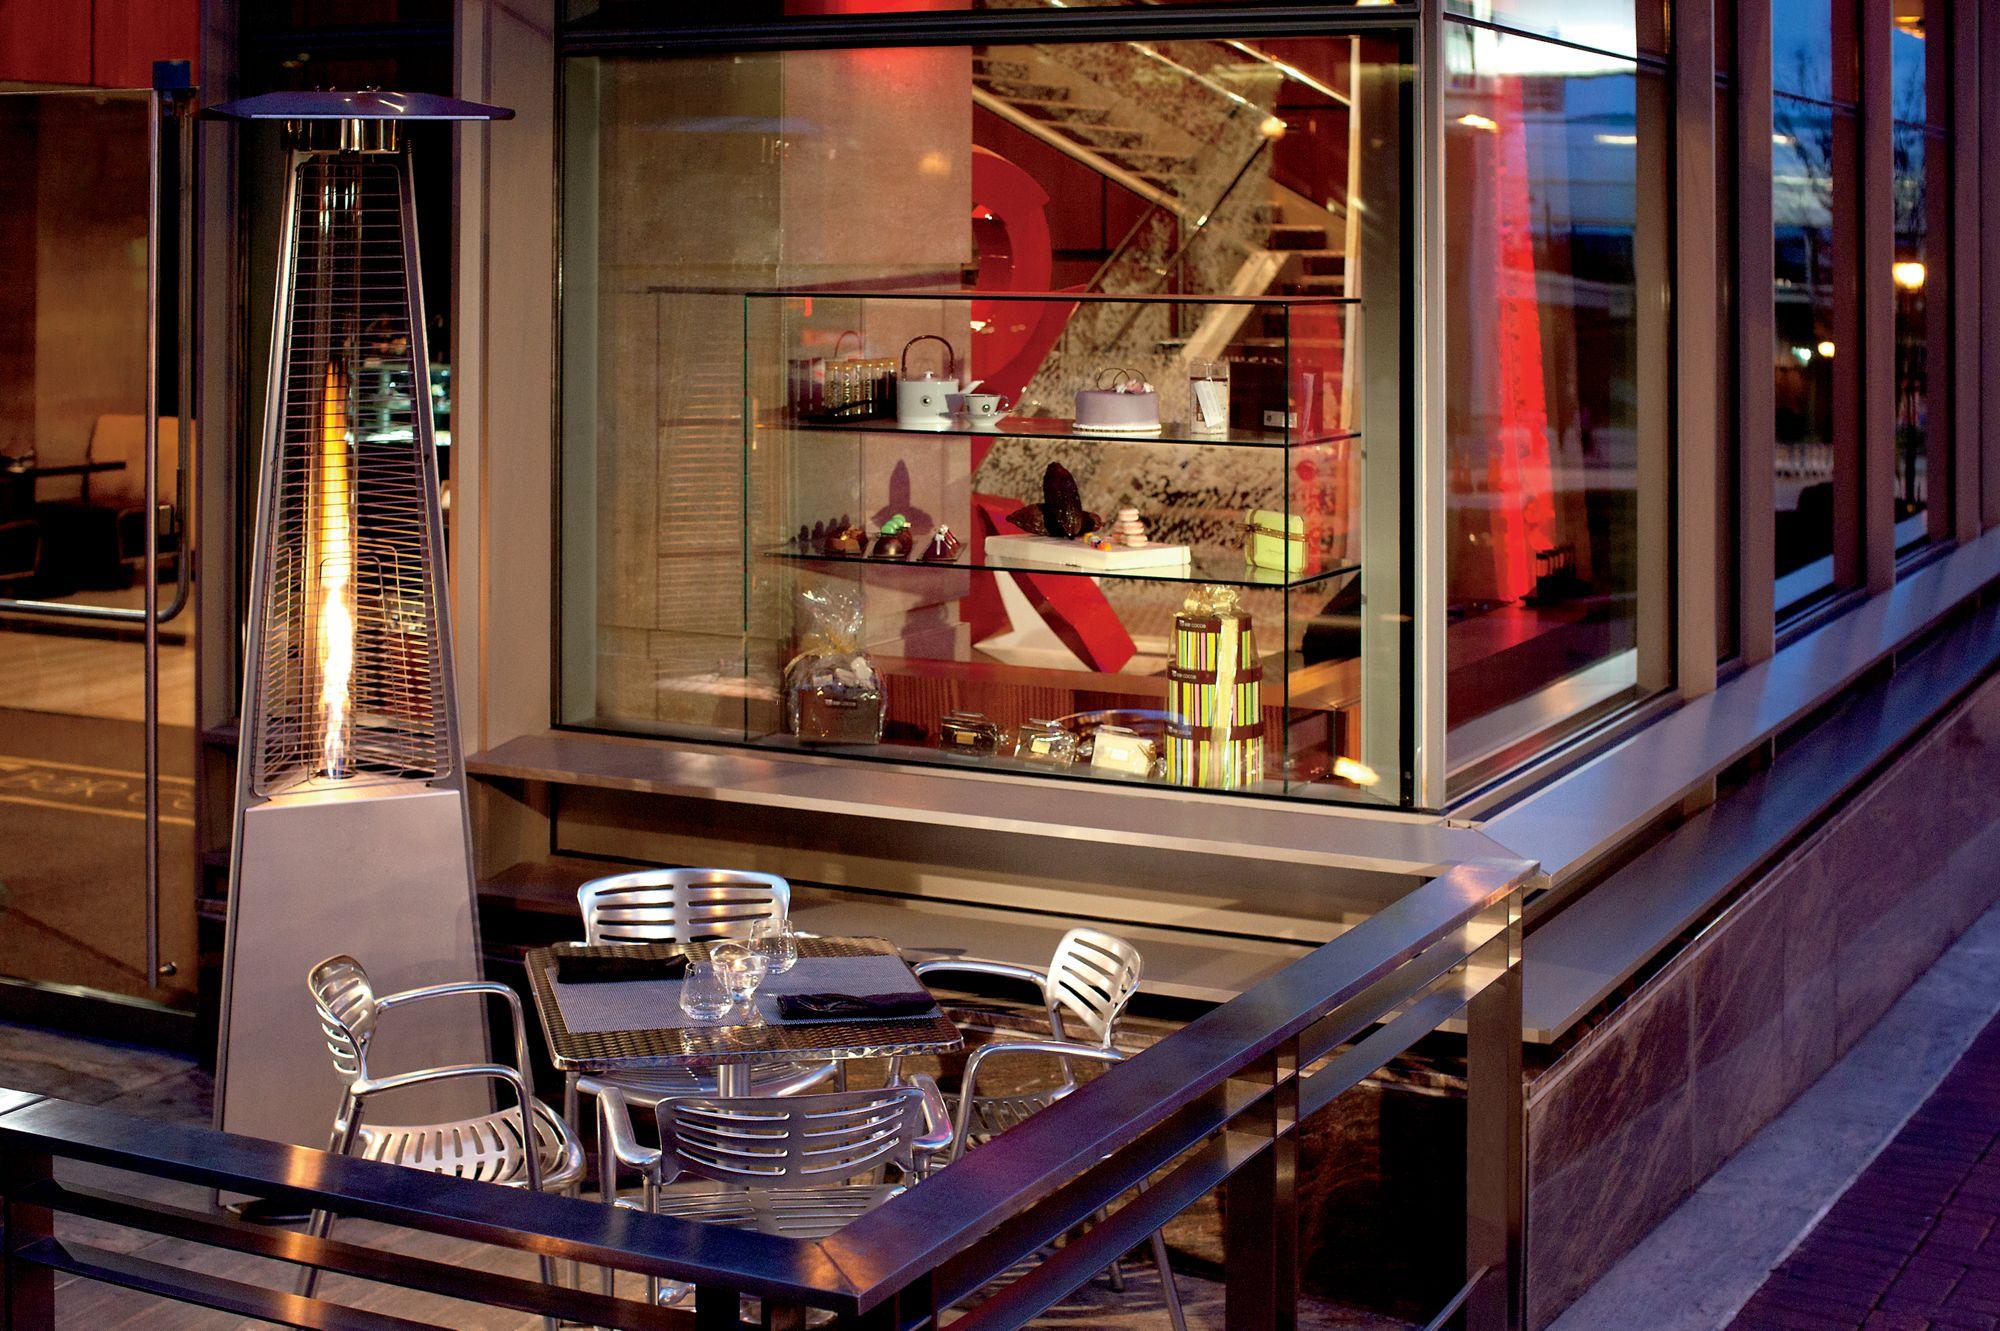 The Ritz-Carlton, Charlotte image 14